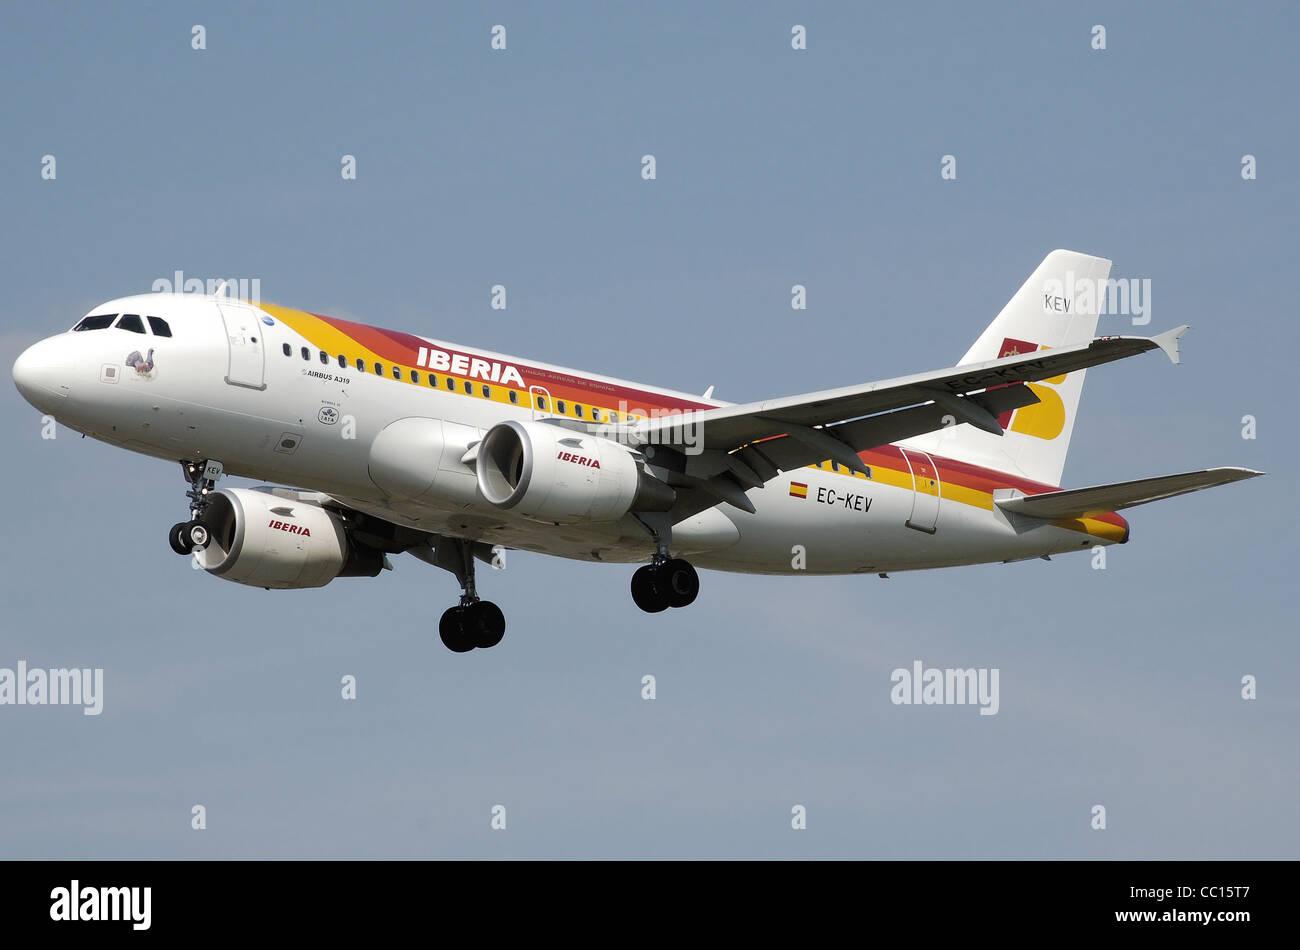 Iberia Airbus A319-100 (EC-KEV) landing at London Heathrow Airport. - Stock Image